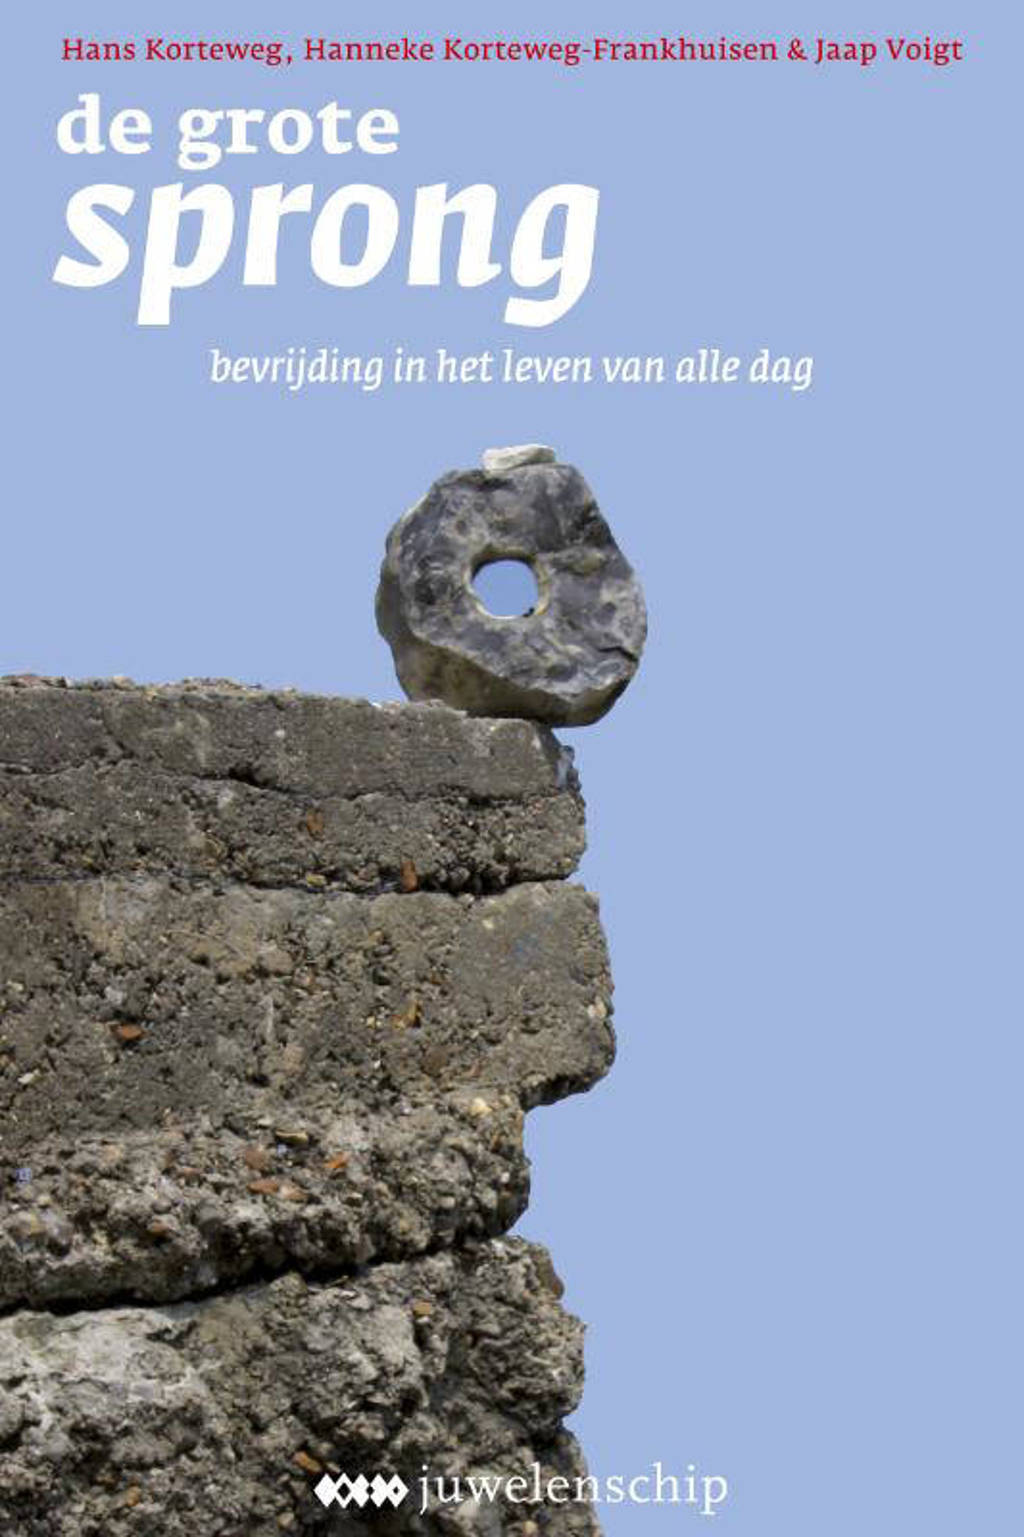 De grote sprong - H. Korteweg, Hanneke Korteweg-Frankhuisen en J. Voigt